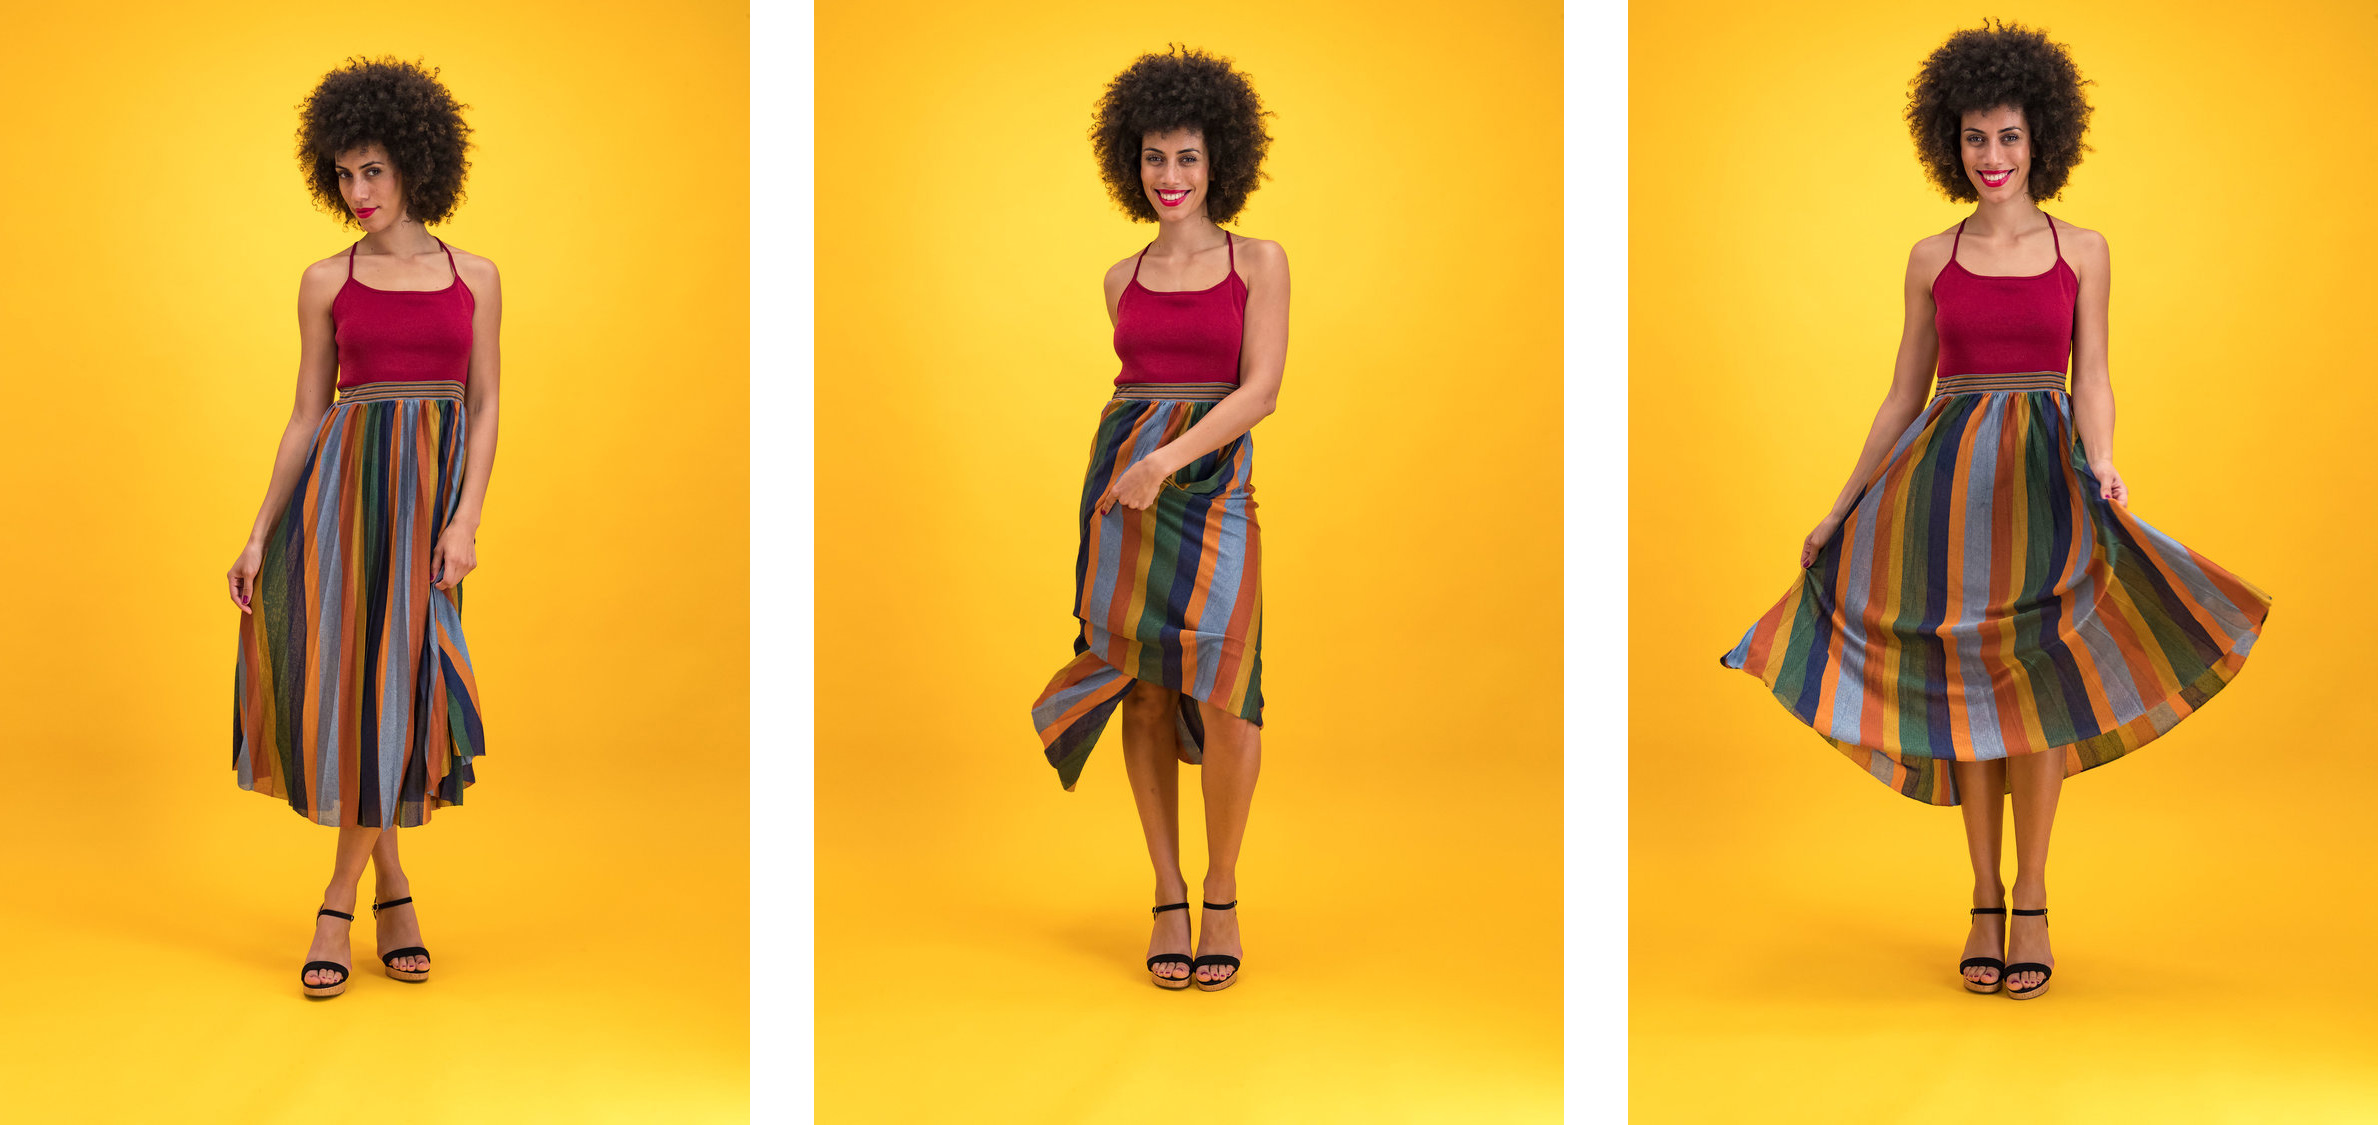 fotografia-moda-ecommerce-10 Fotografía de moda para e-commerce